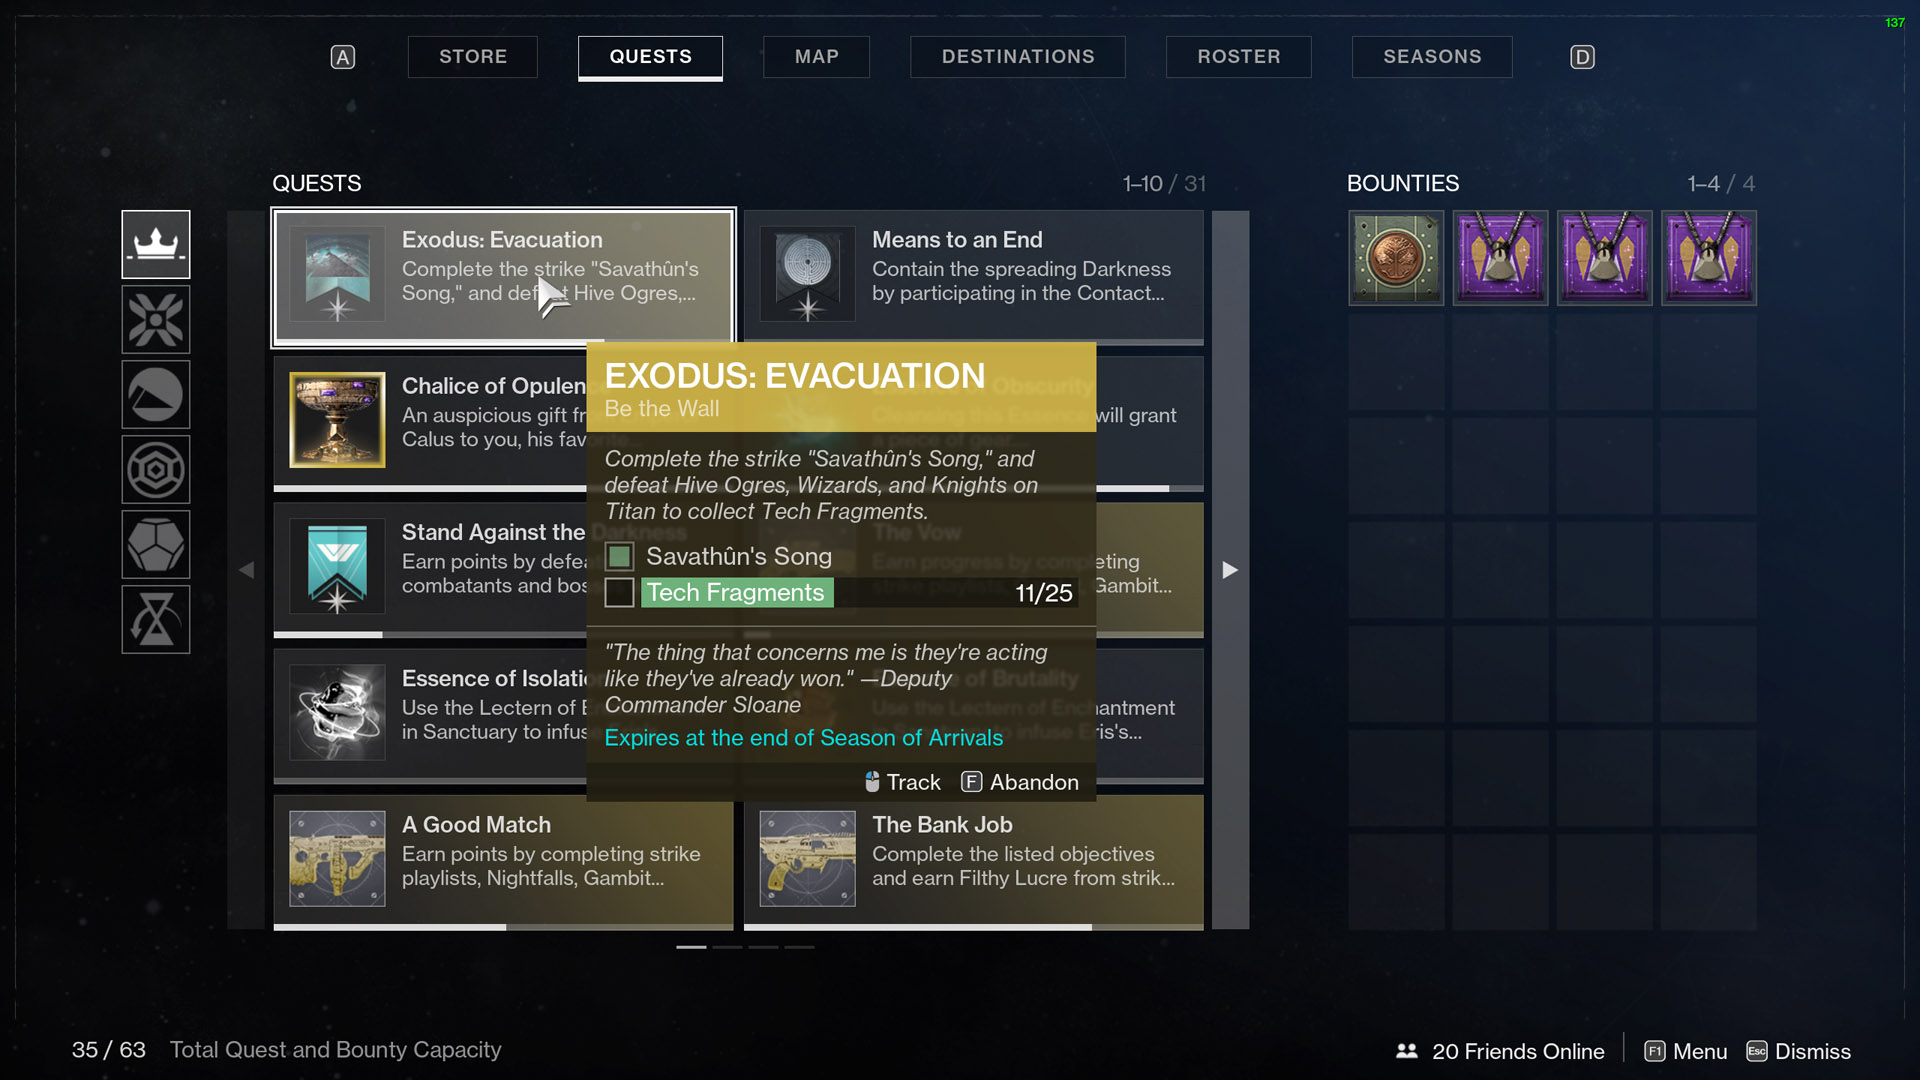 Destiny 2 Exodus Evacuation Be the Wall